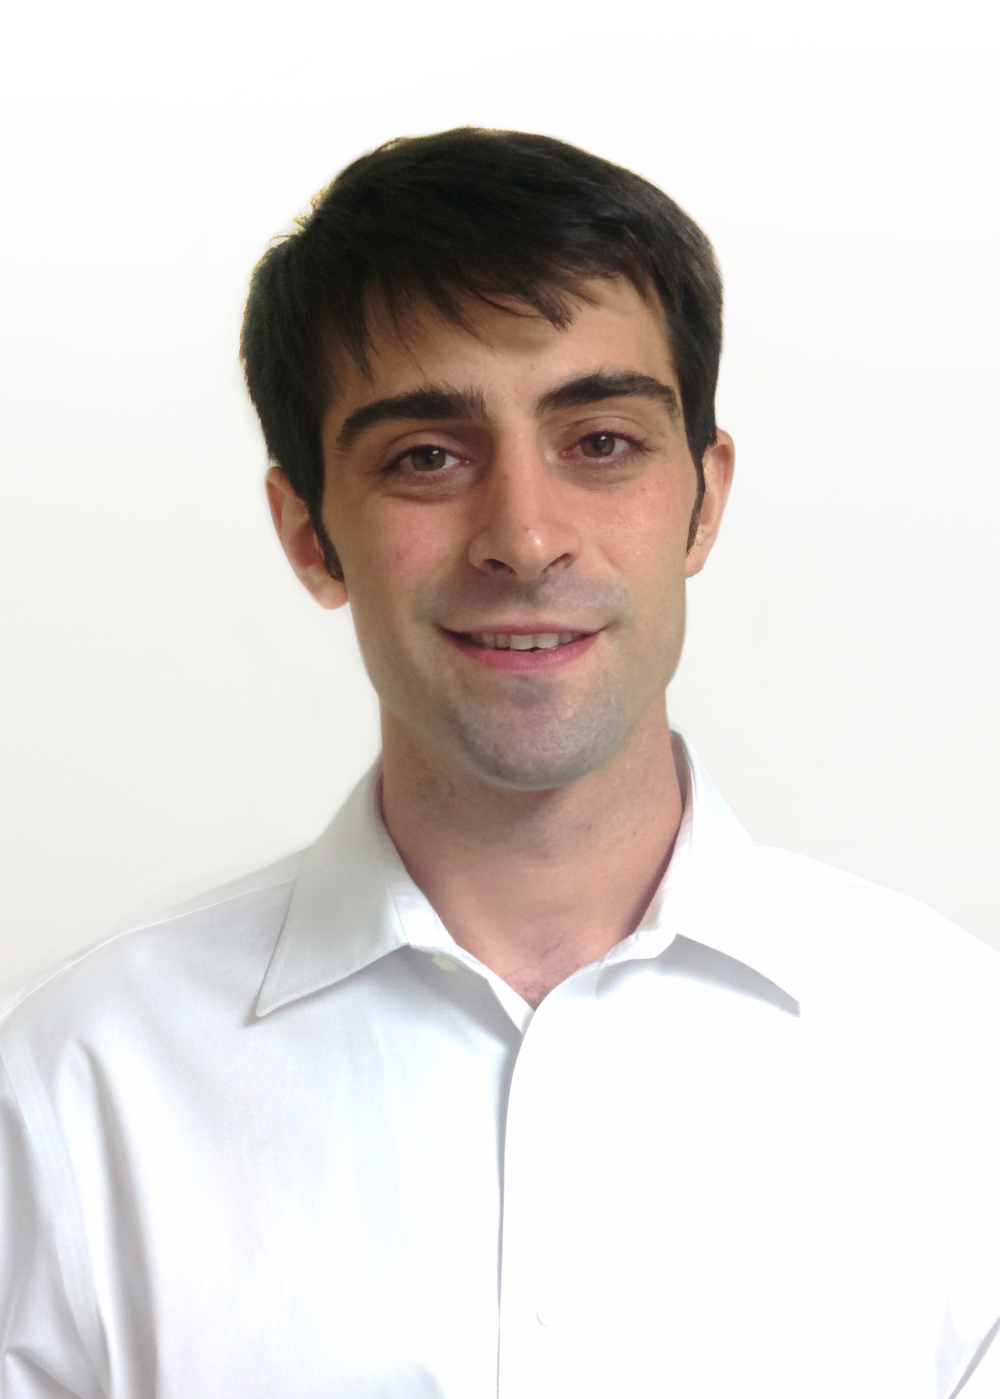 Luke Raithel, Webinar, Producer, Webcast Experts